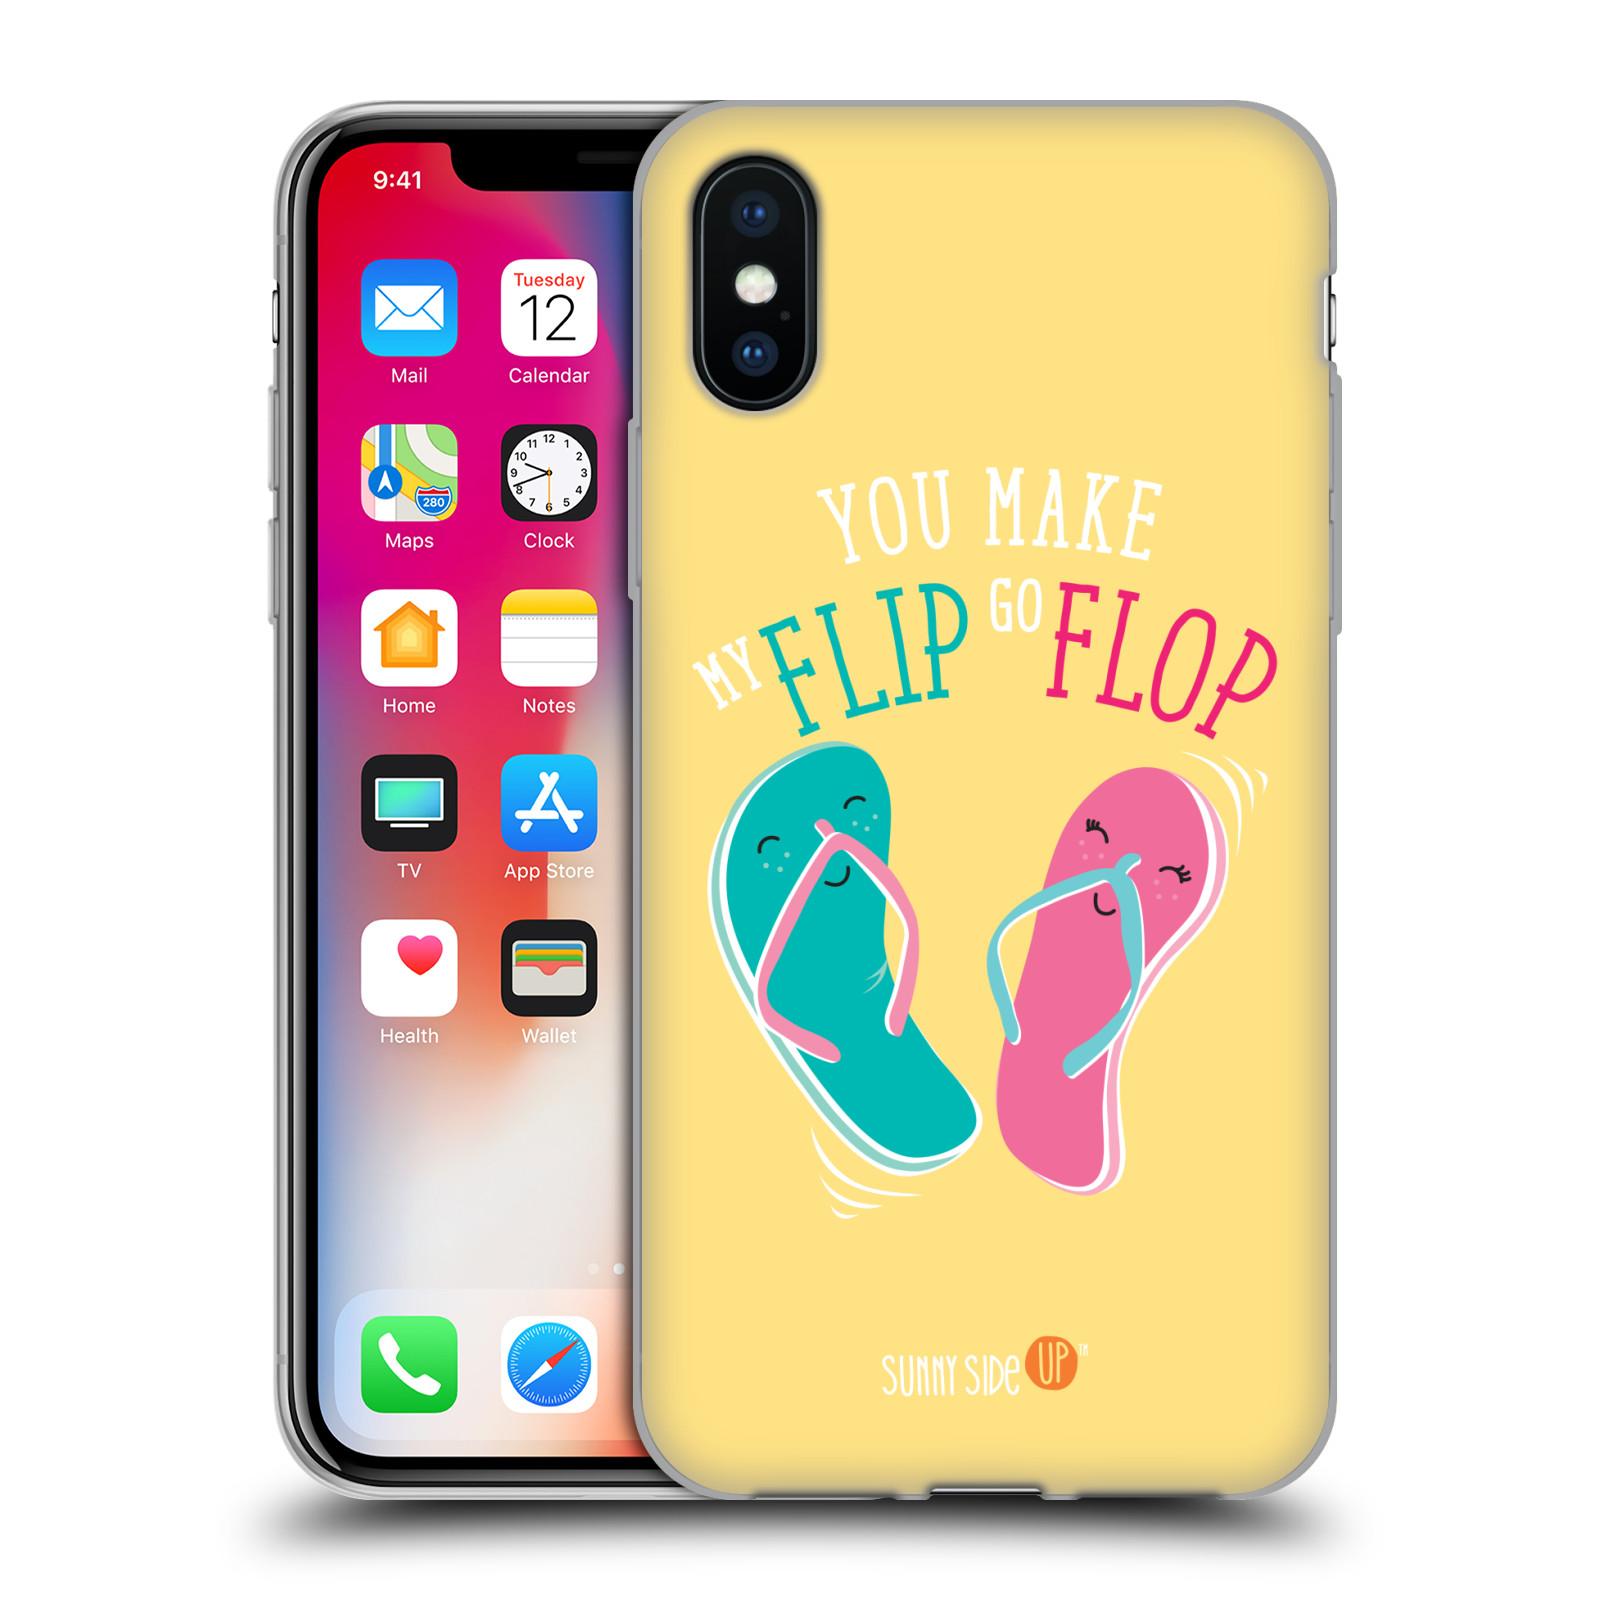 MUY-POP-ESTATE-VOLTI-SOLARI-IN-SU-COVER-MORBIDA-IN-GEL-PER-APPLE-iPHONE-TELEFONI